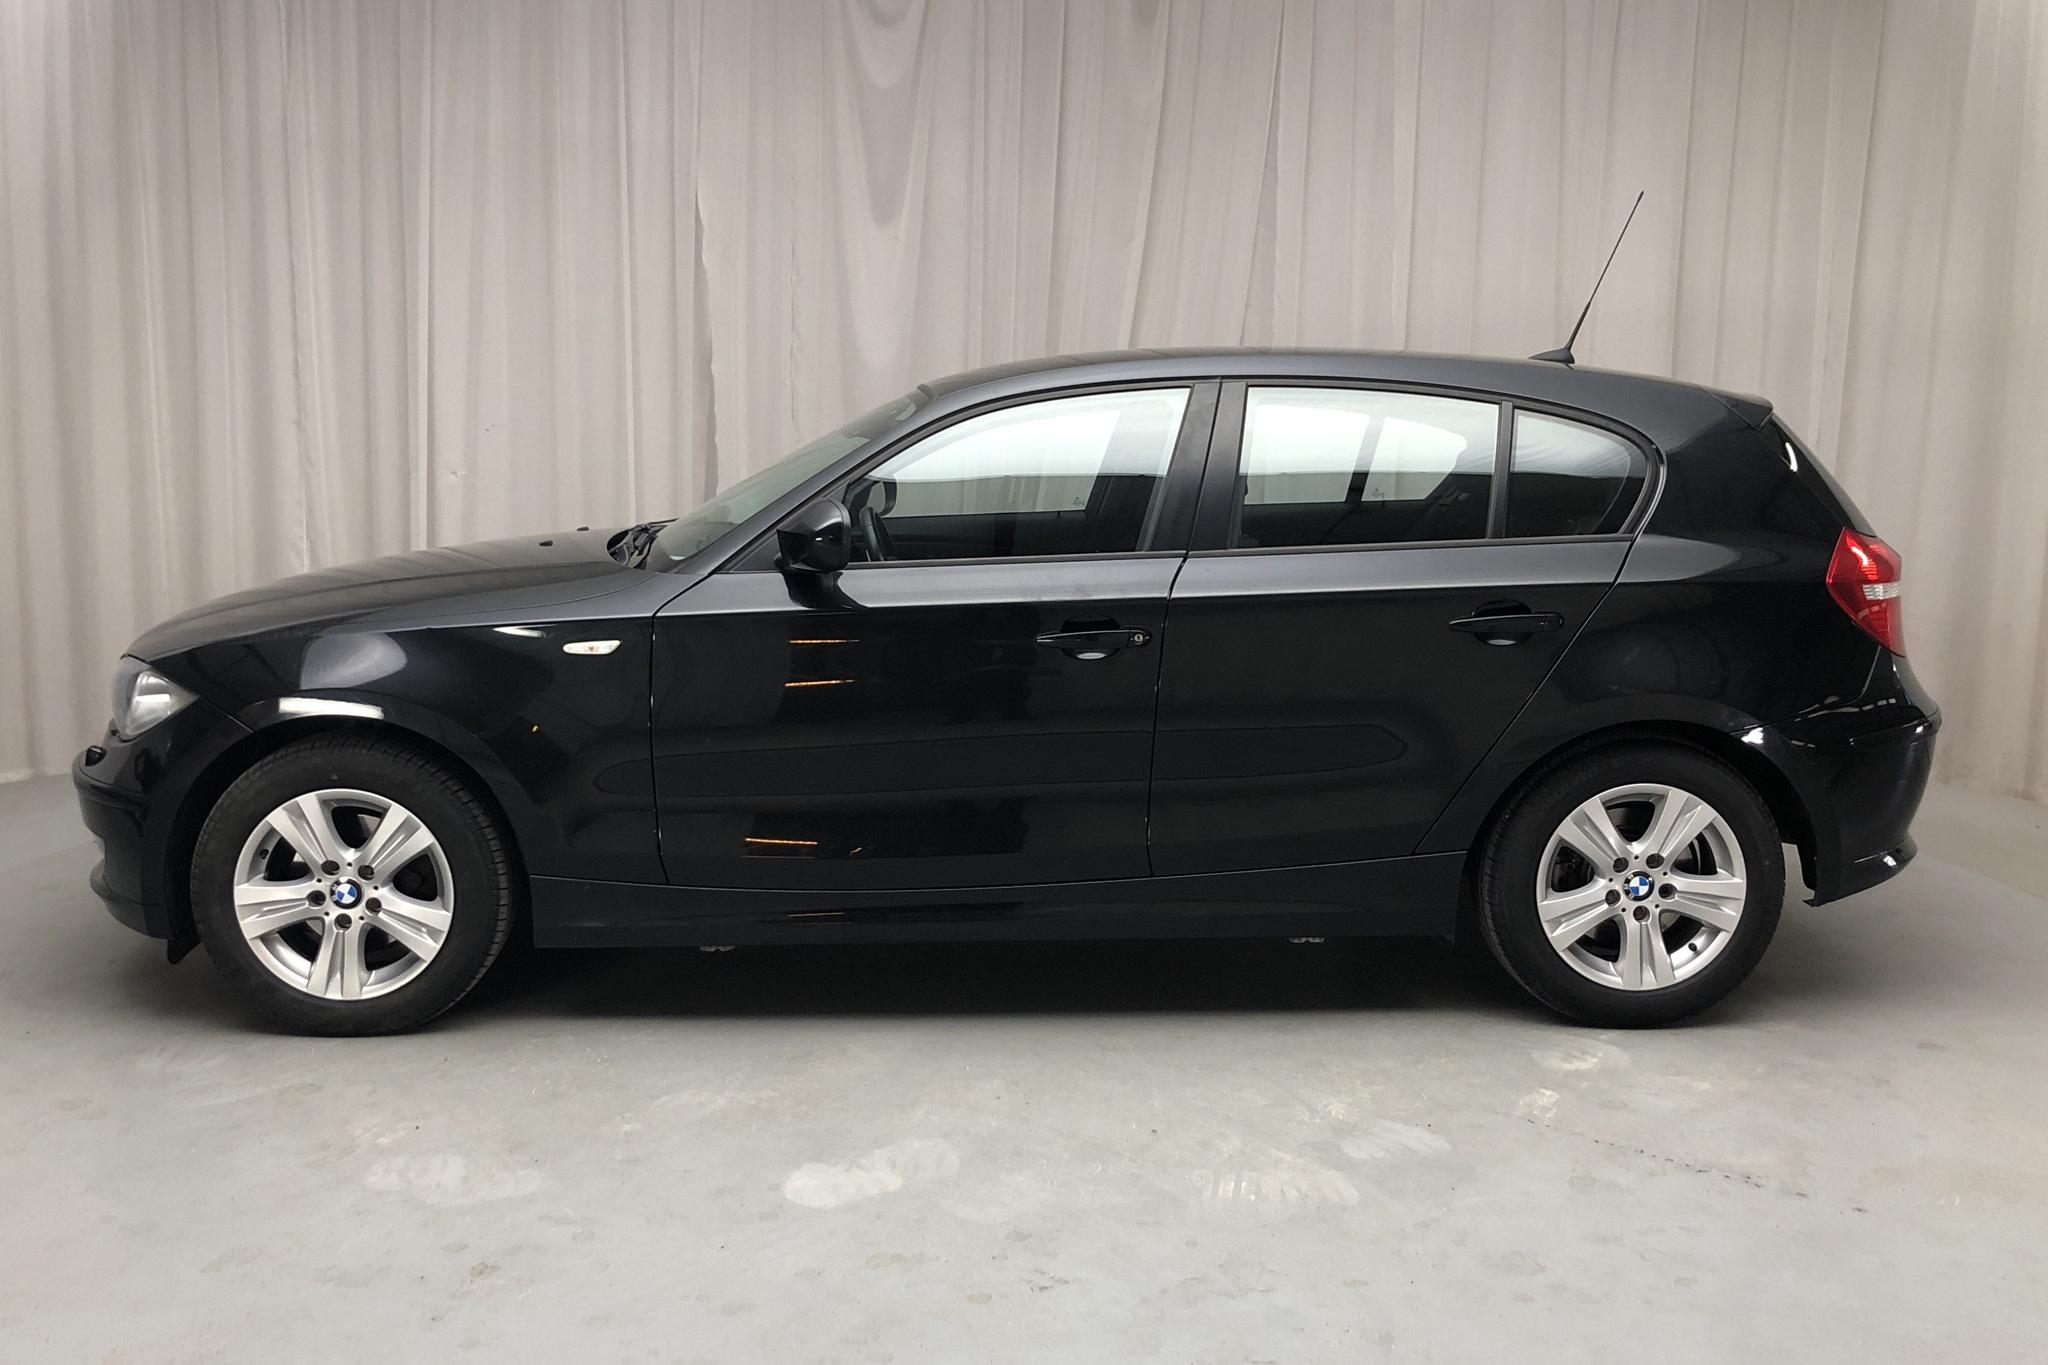 BMW 118d 5dr, E87 (143hk) - 161 240 km - Manual - black - 2010